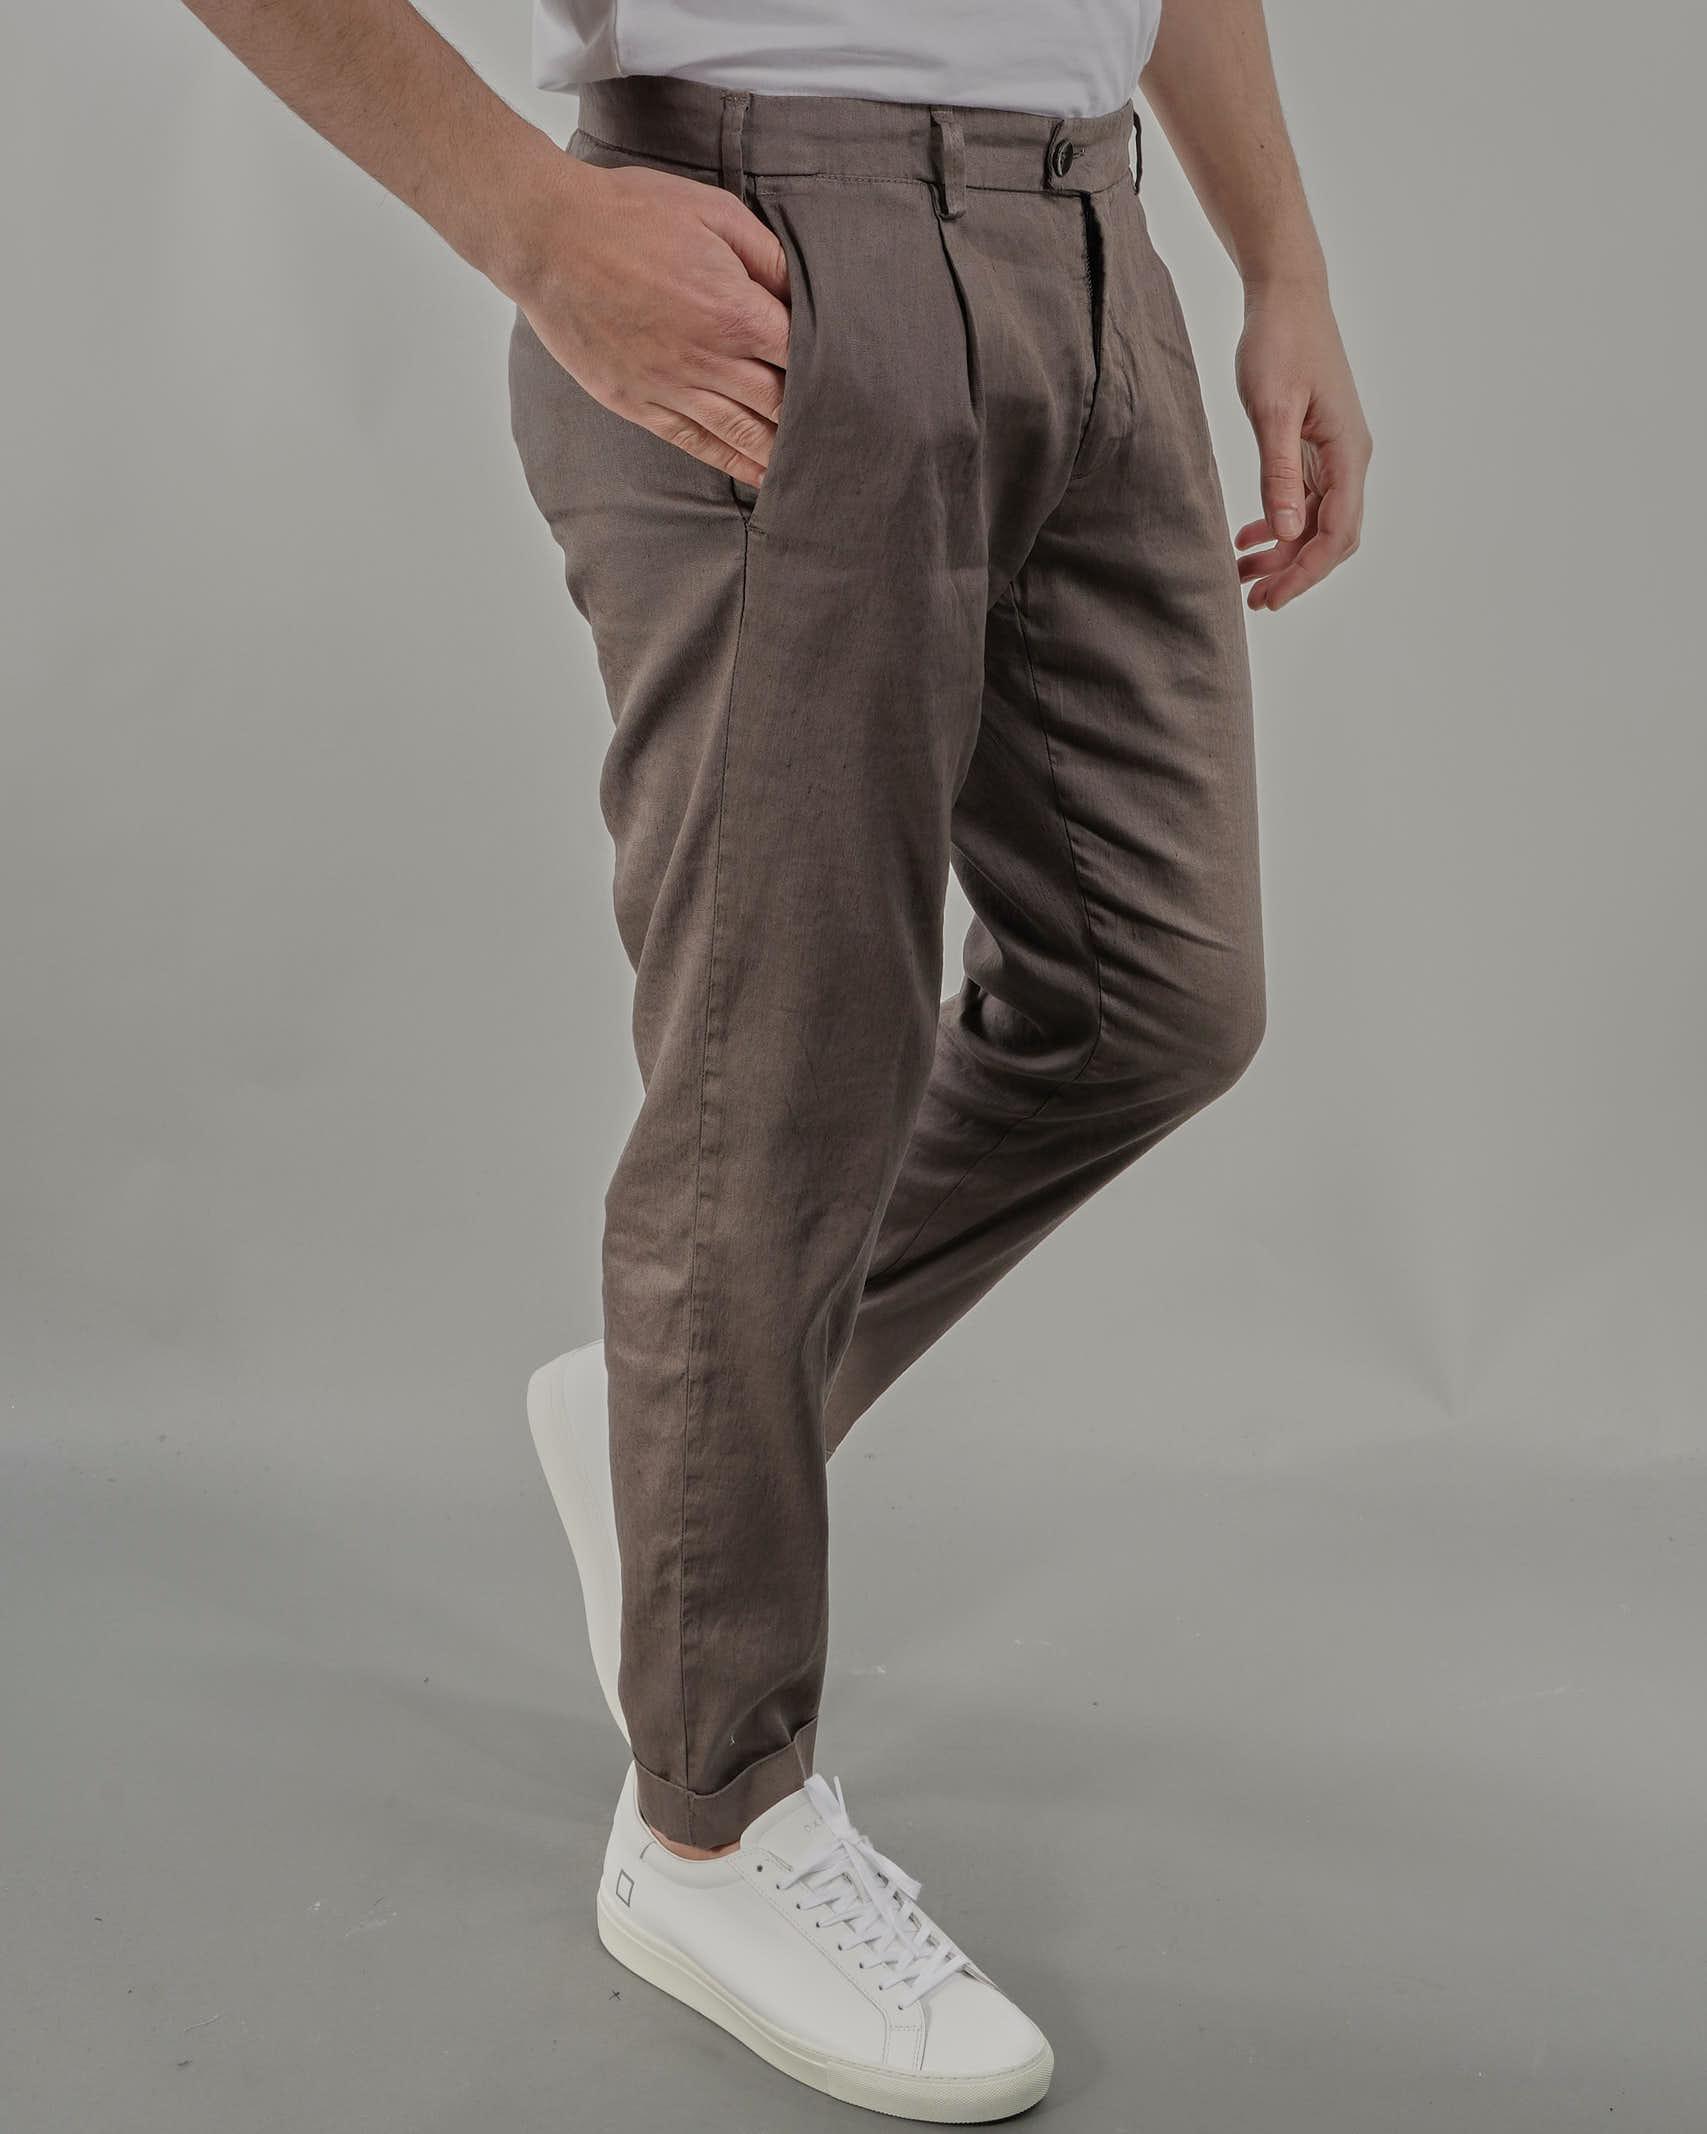 Pantalone in lino con pences Jeordie's JEORDIE'S | Pantalone | 77202356